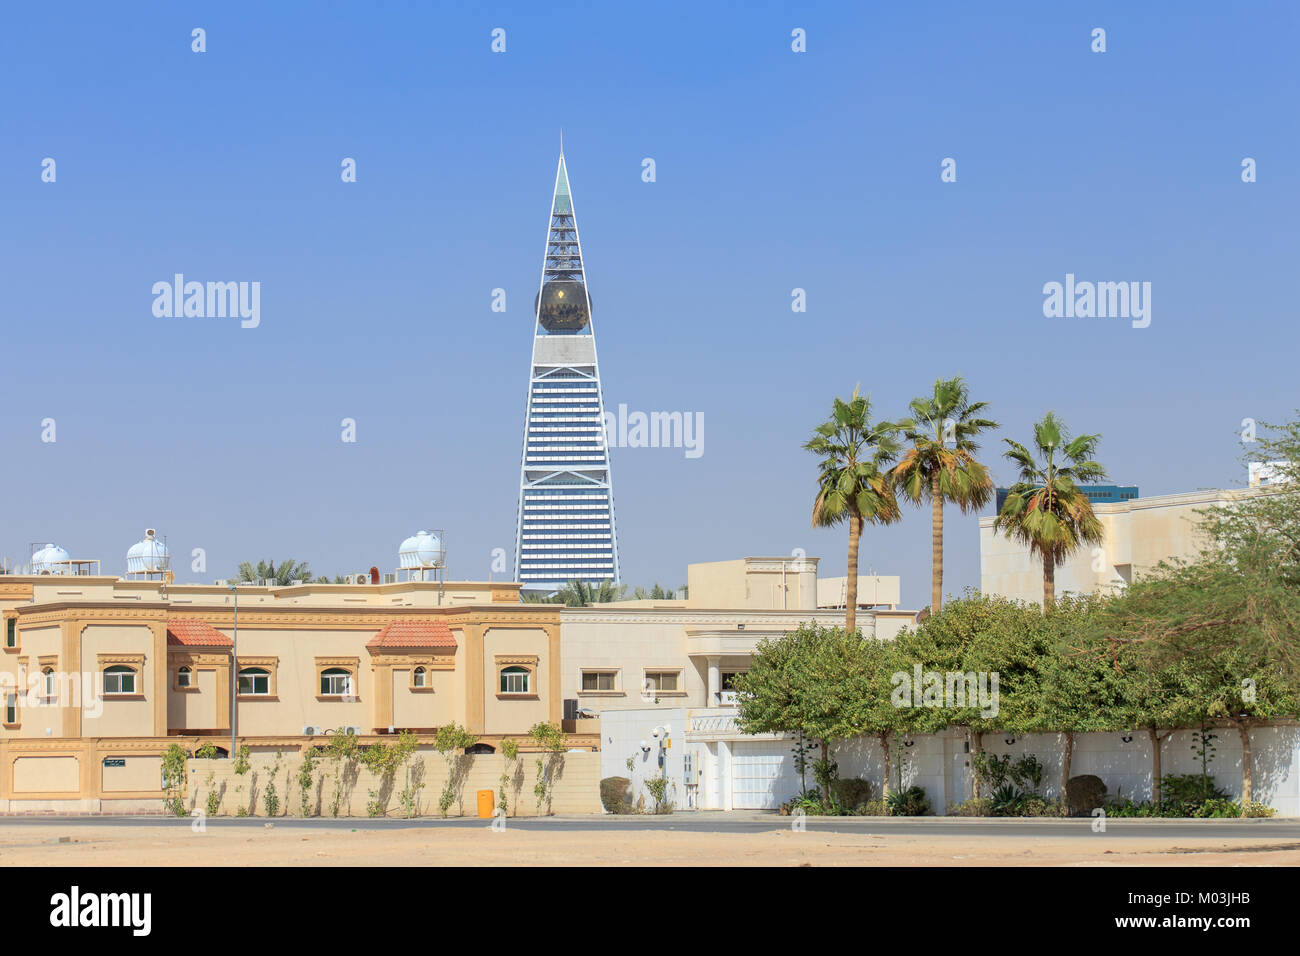 Rues de la région de Riyad en Arabie Saoudite Photo Stock